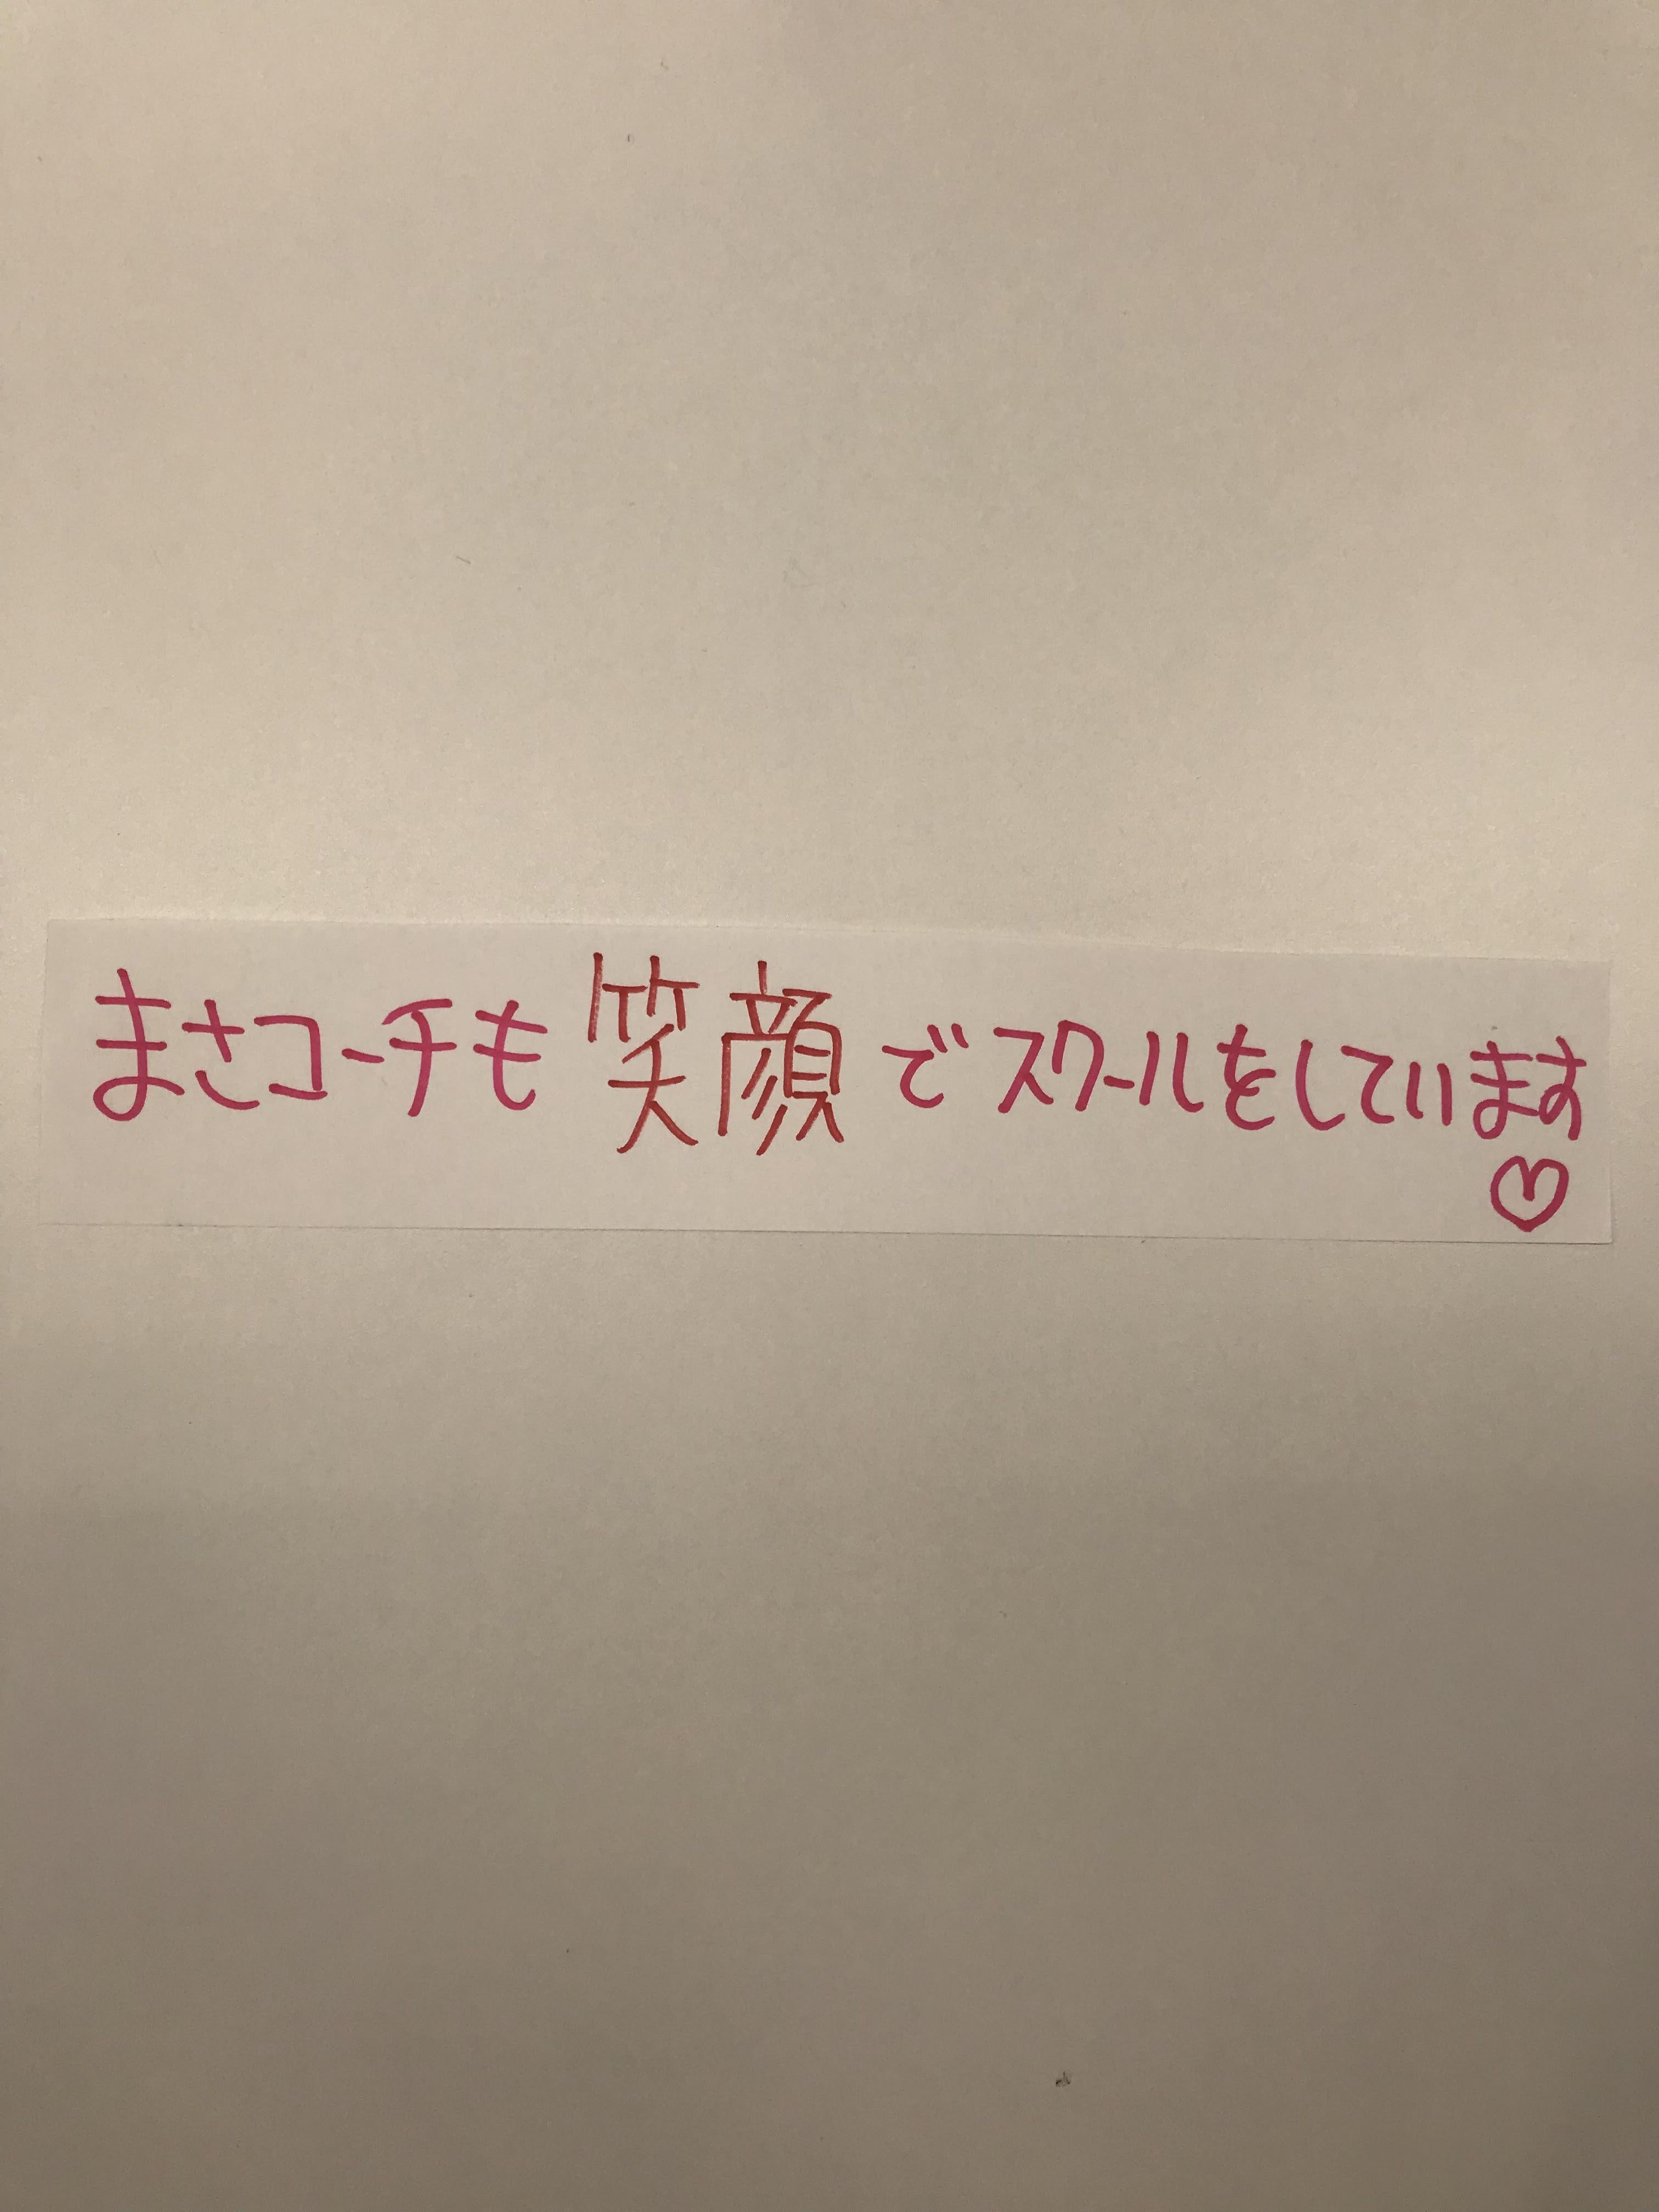 https://chsc.jp/news/up_images/%2331%2811%29.jpg